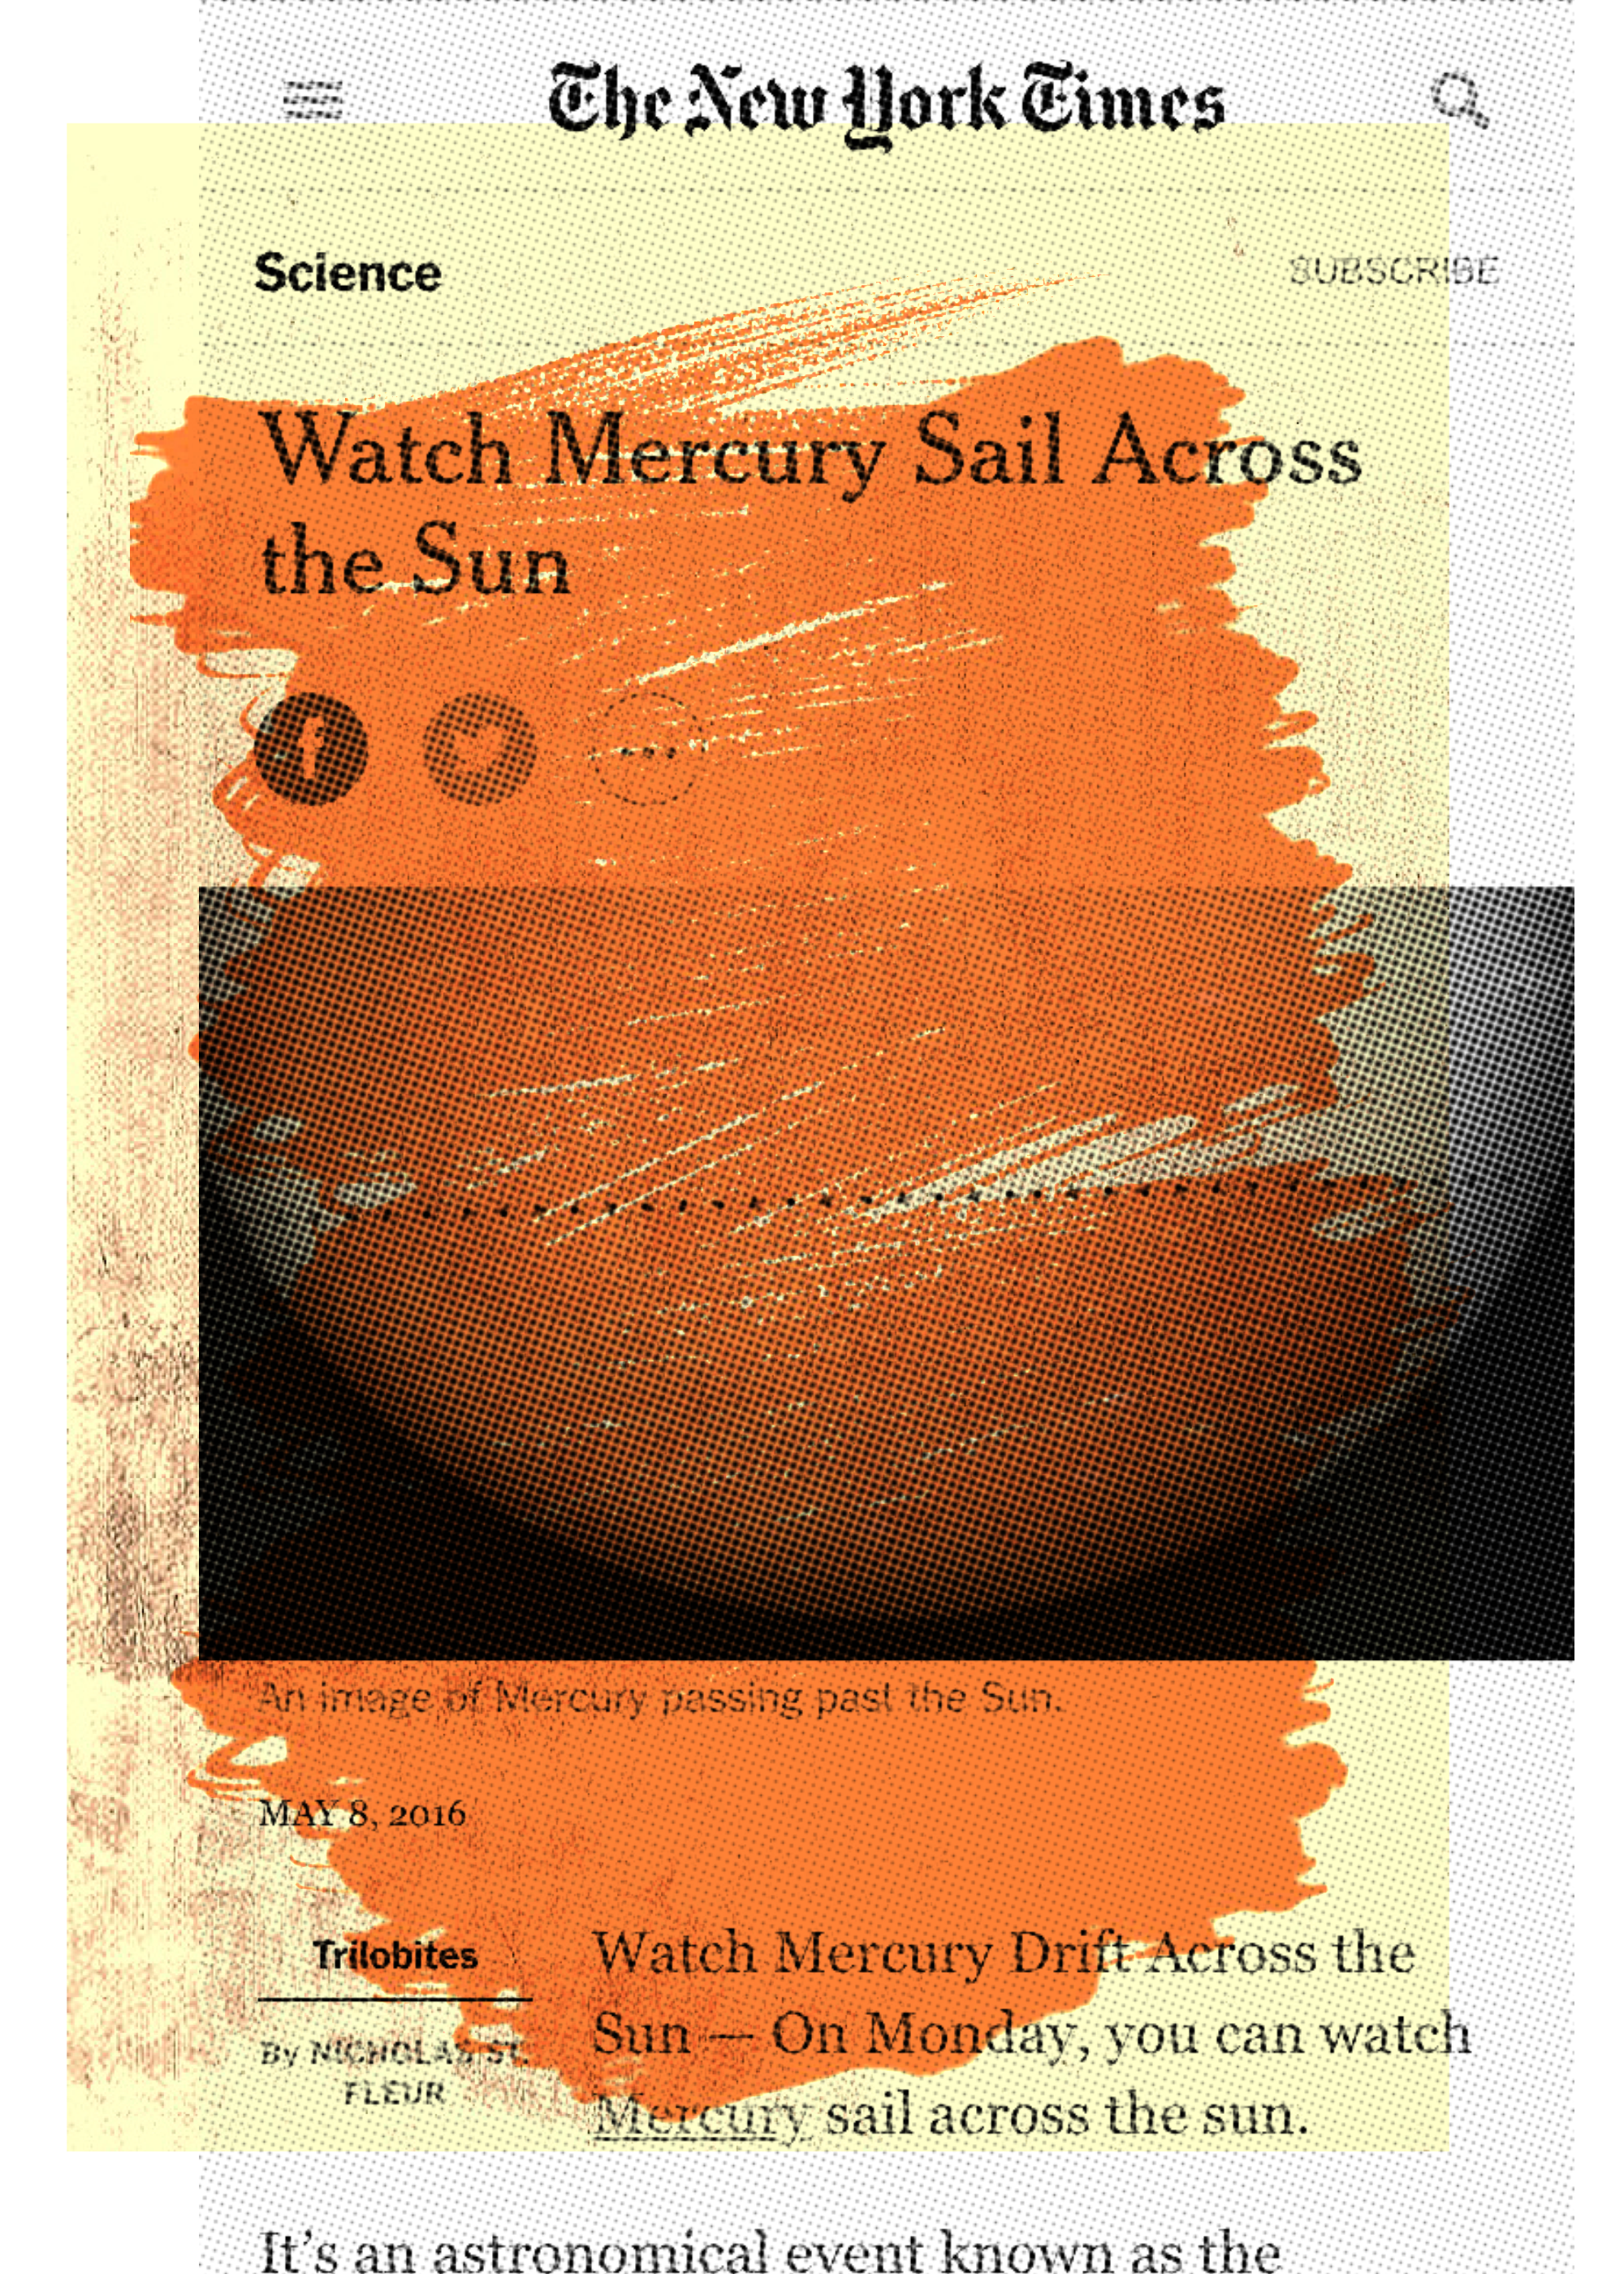 """Watch Mercury Sail Across the Sun"", iPhone 6S, digital image, 2016."